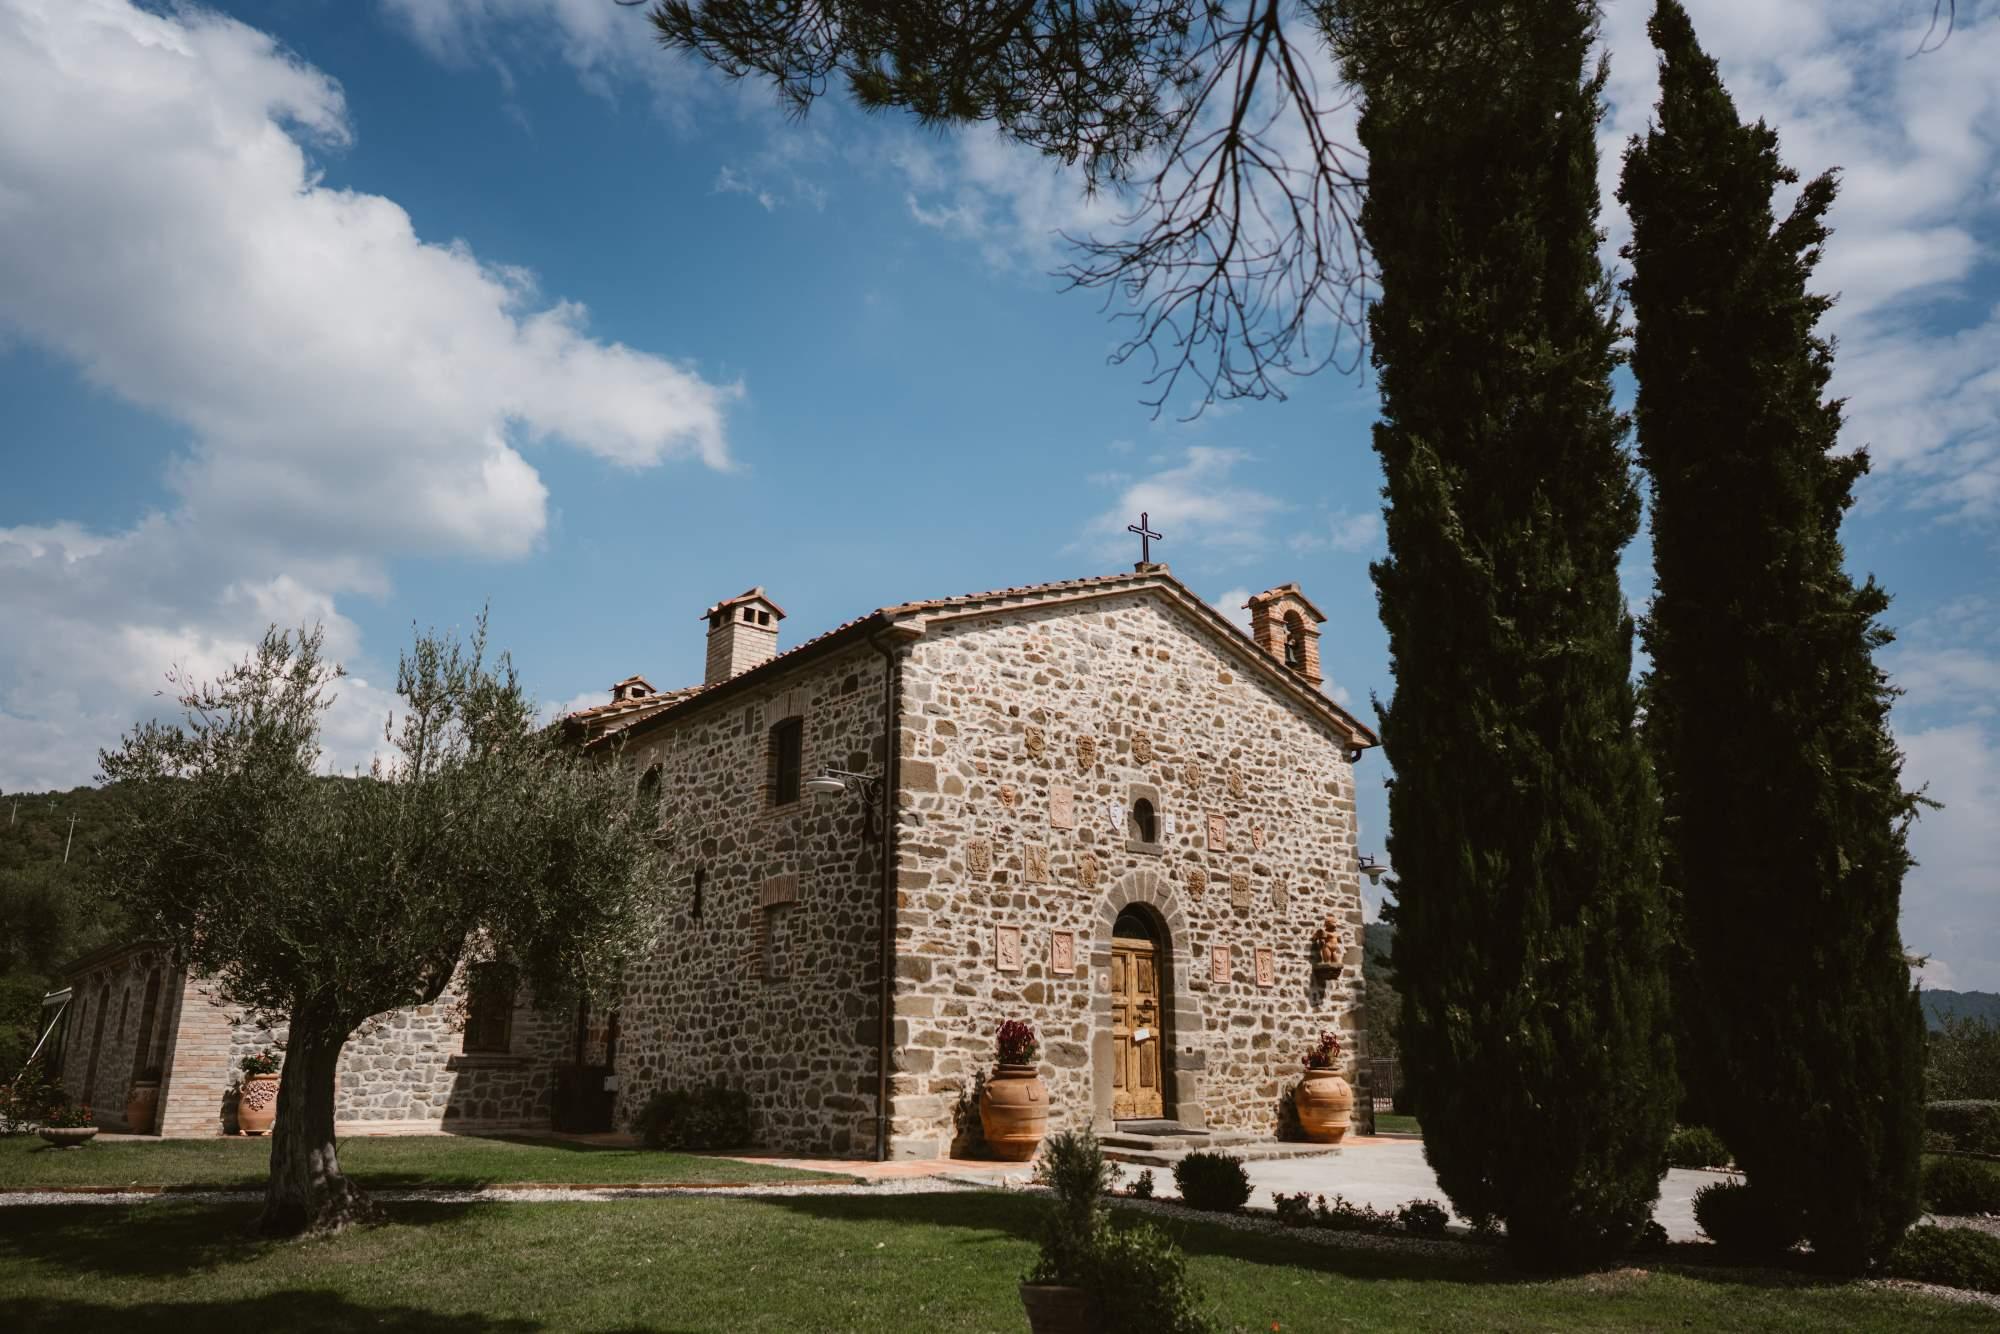 Villa San Crispolto in Tuscany/Umbria Italy,fabulous wedding venue